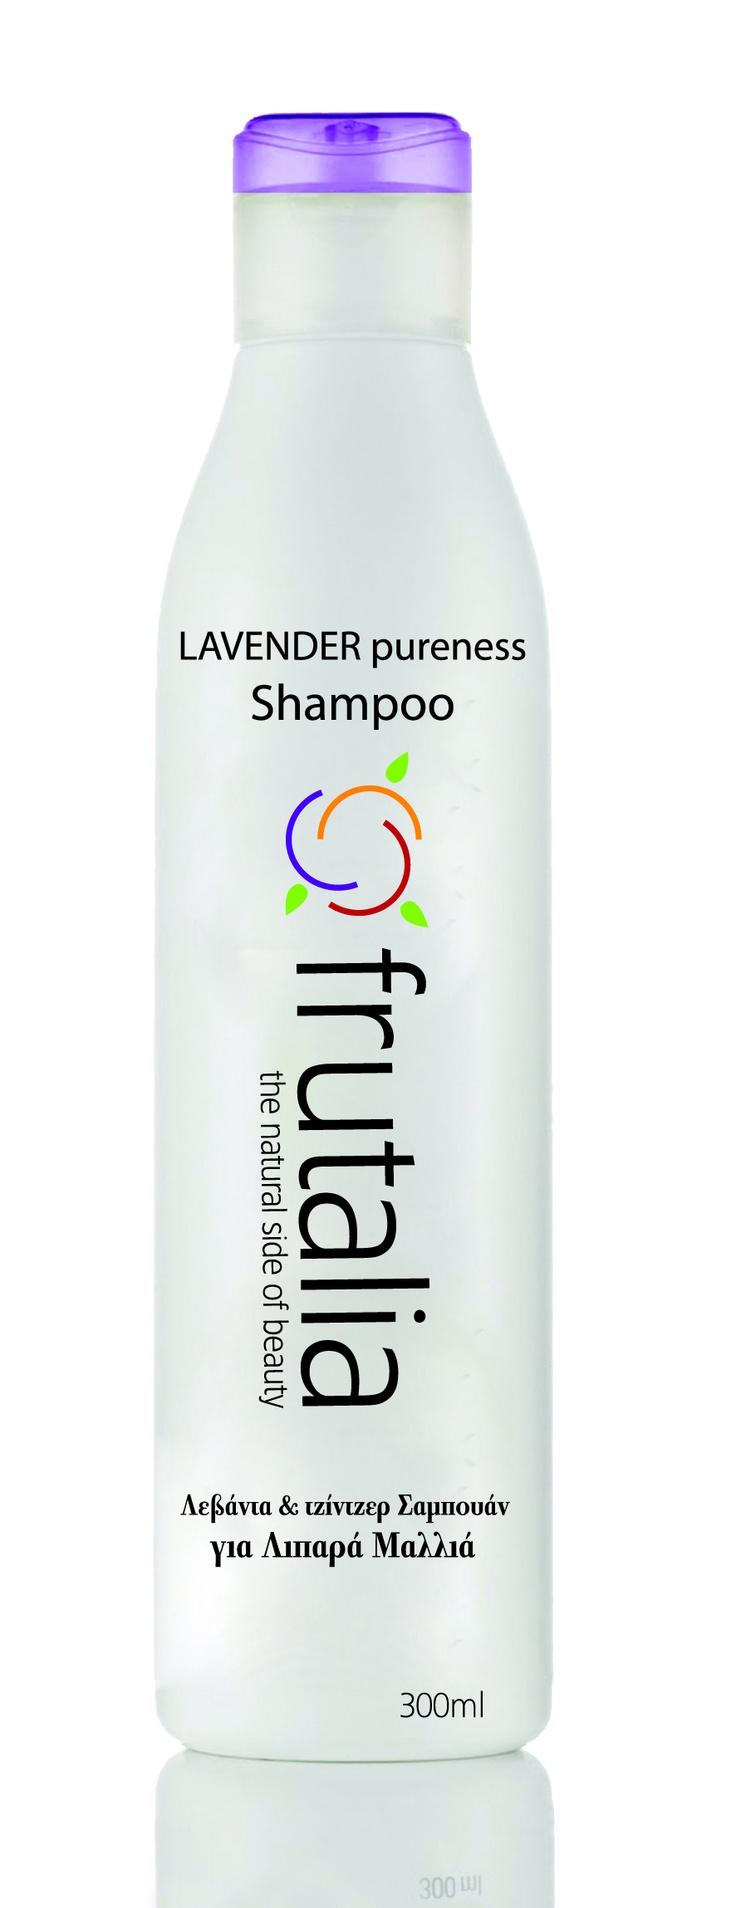 Frutalia lavender shampoo